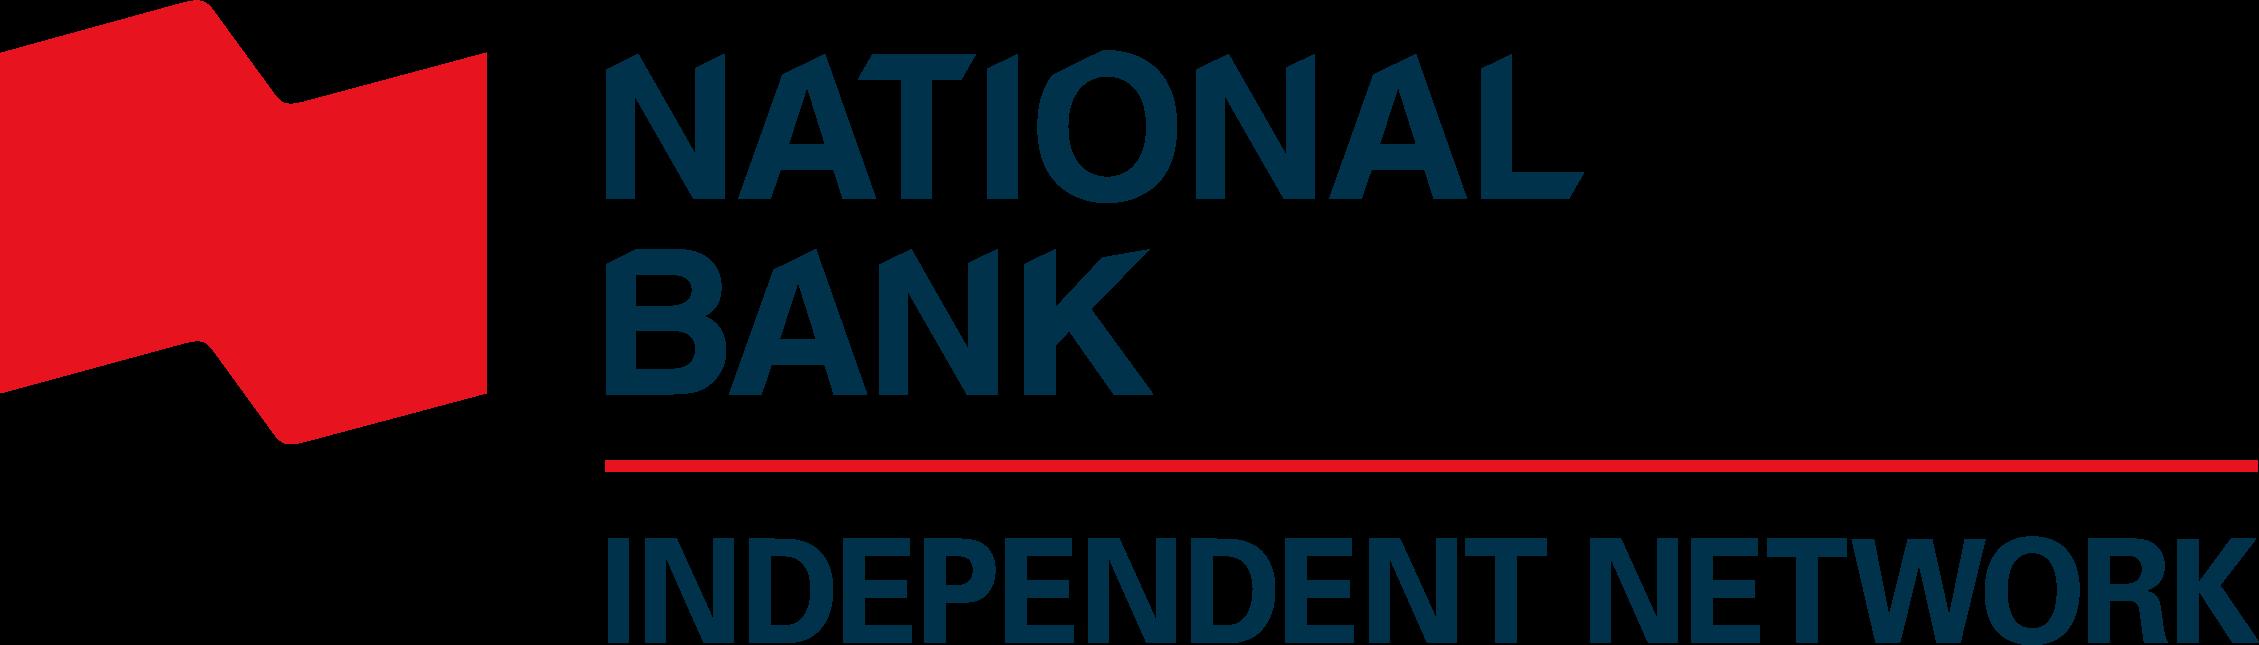 National Bank Independent Network